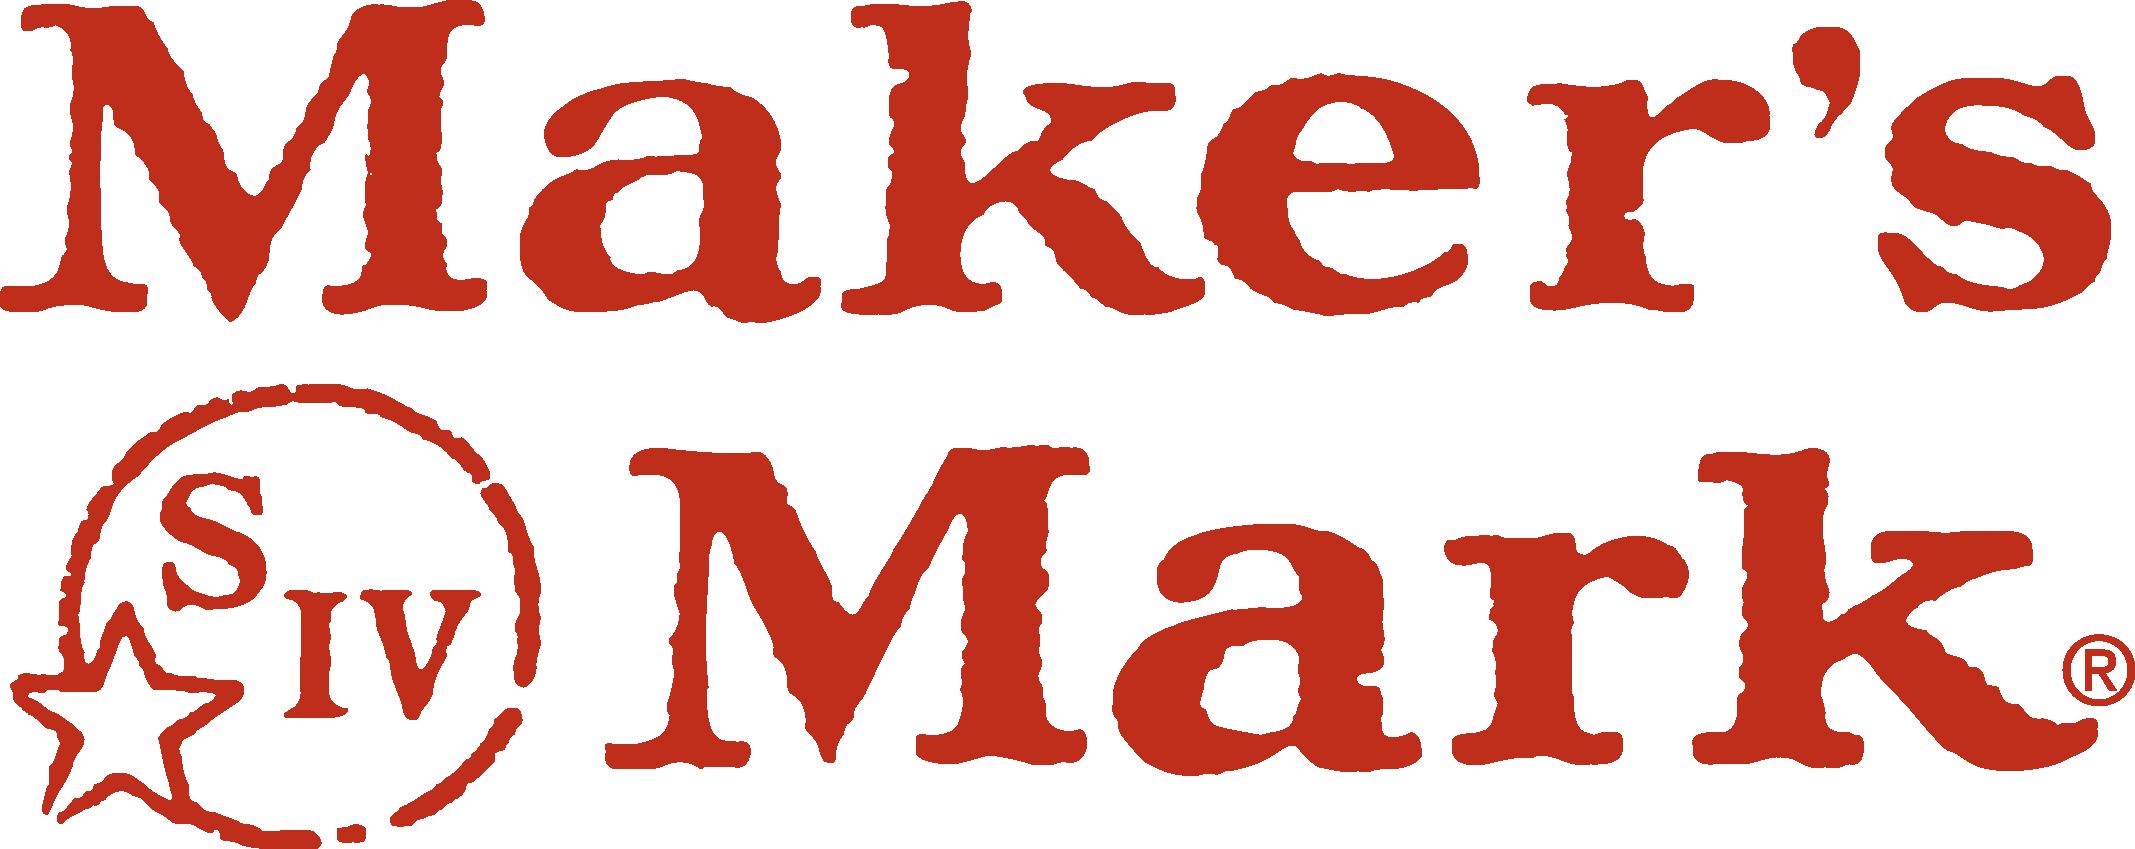 MakersMark_RedLogo_1.png